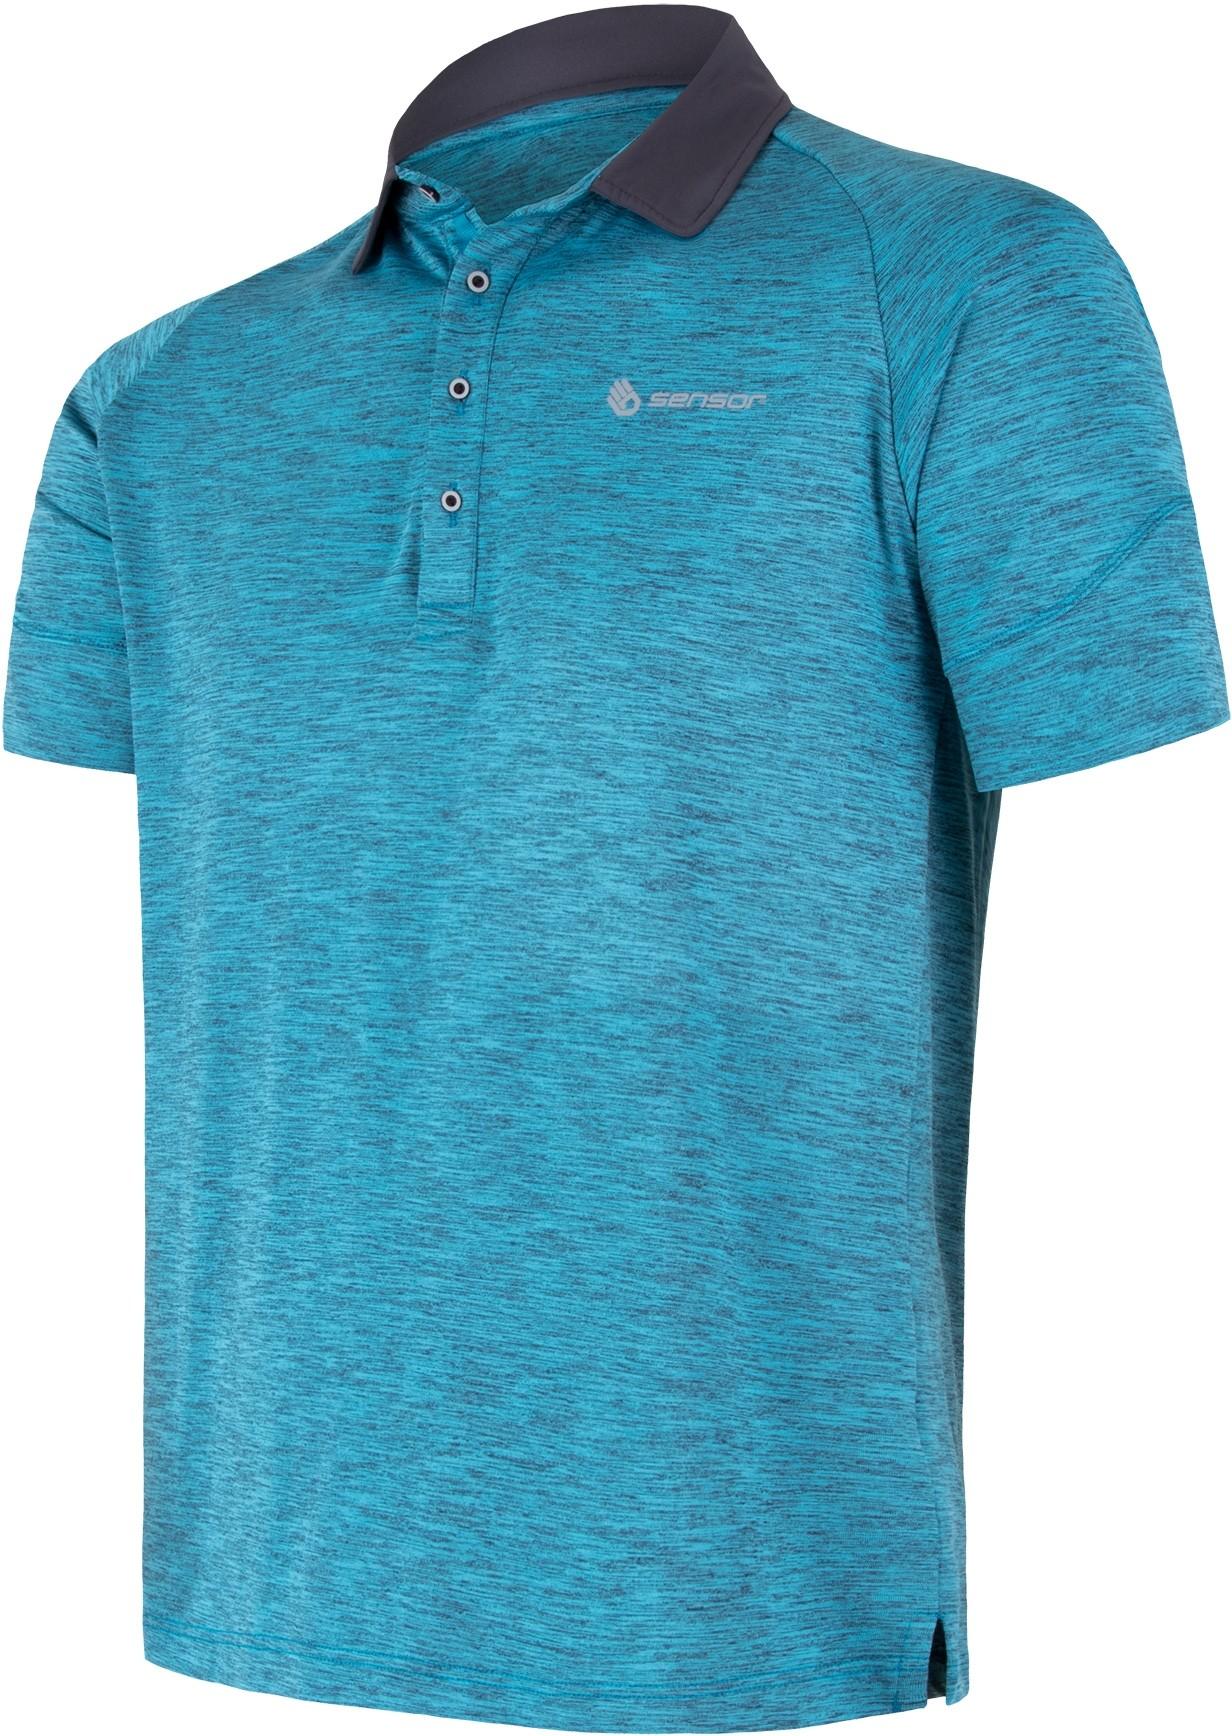 Sensor koszulka polo męska Motion niebieska XL